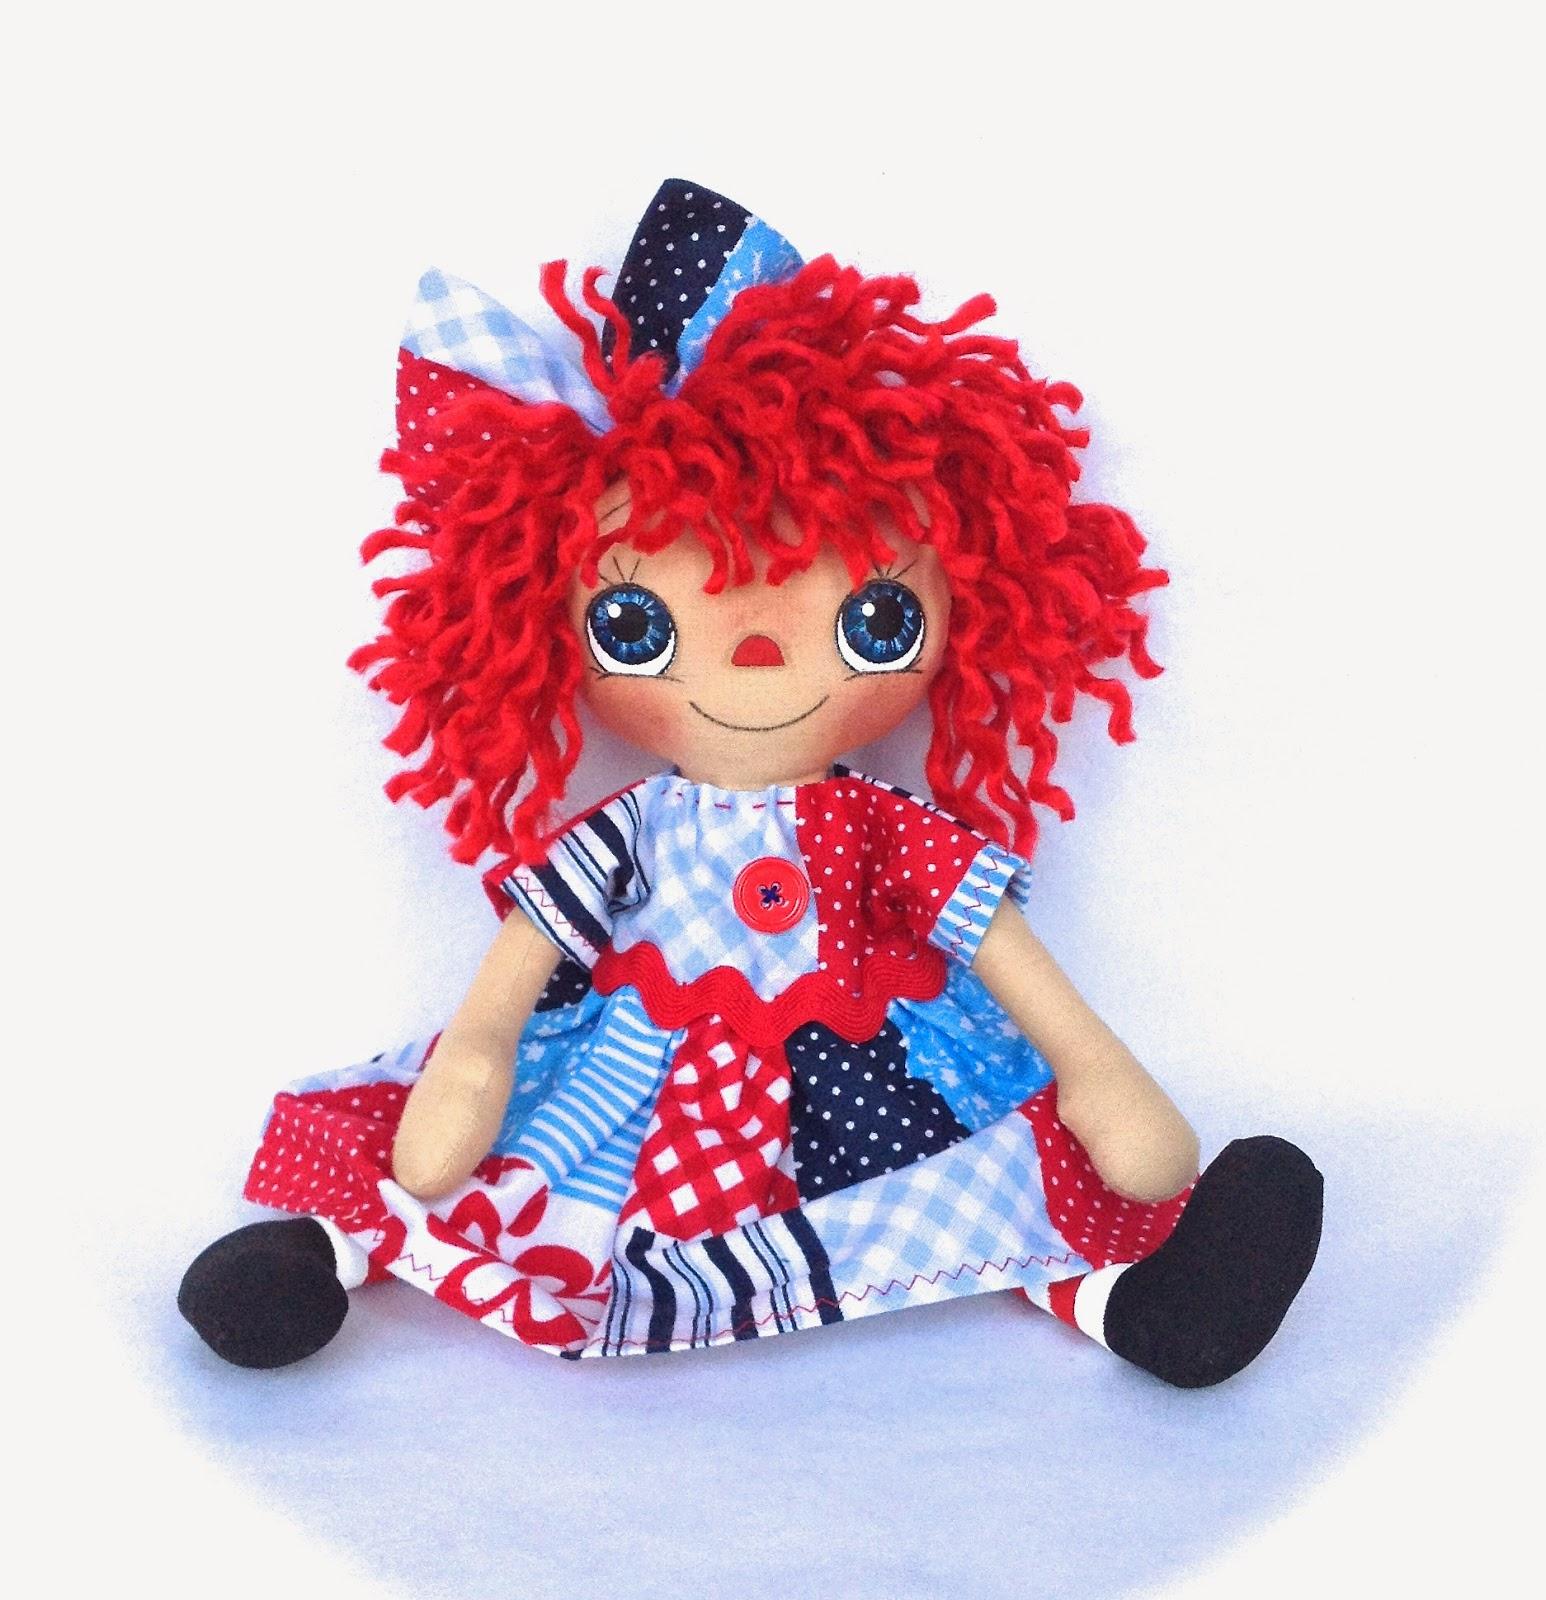 cotton candy dolls